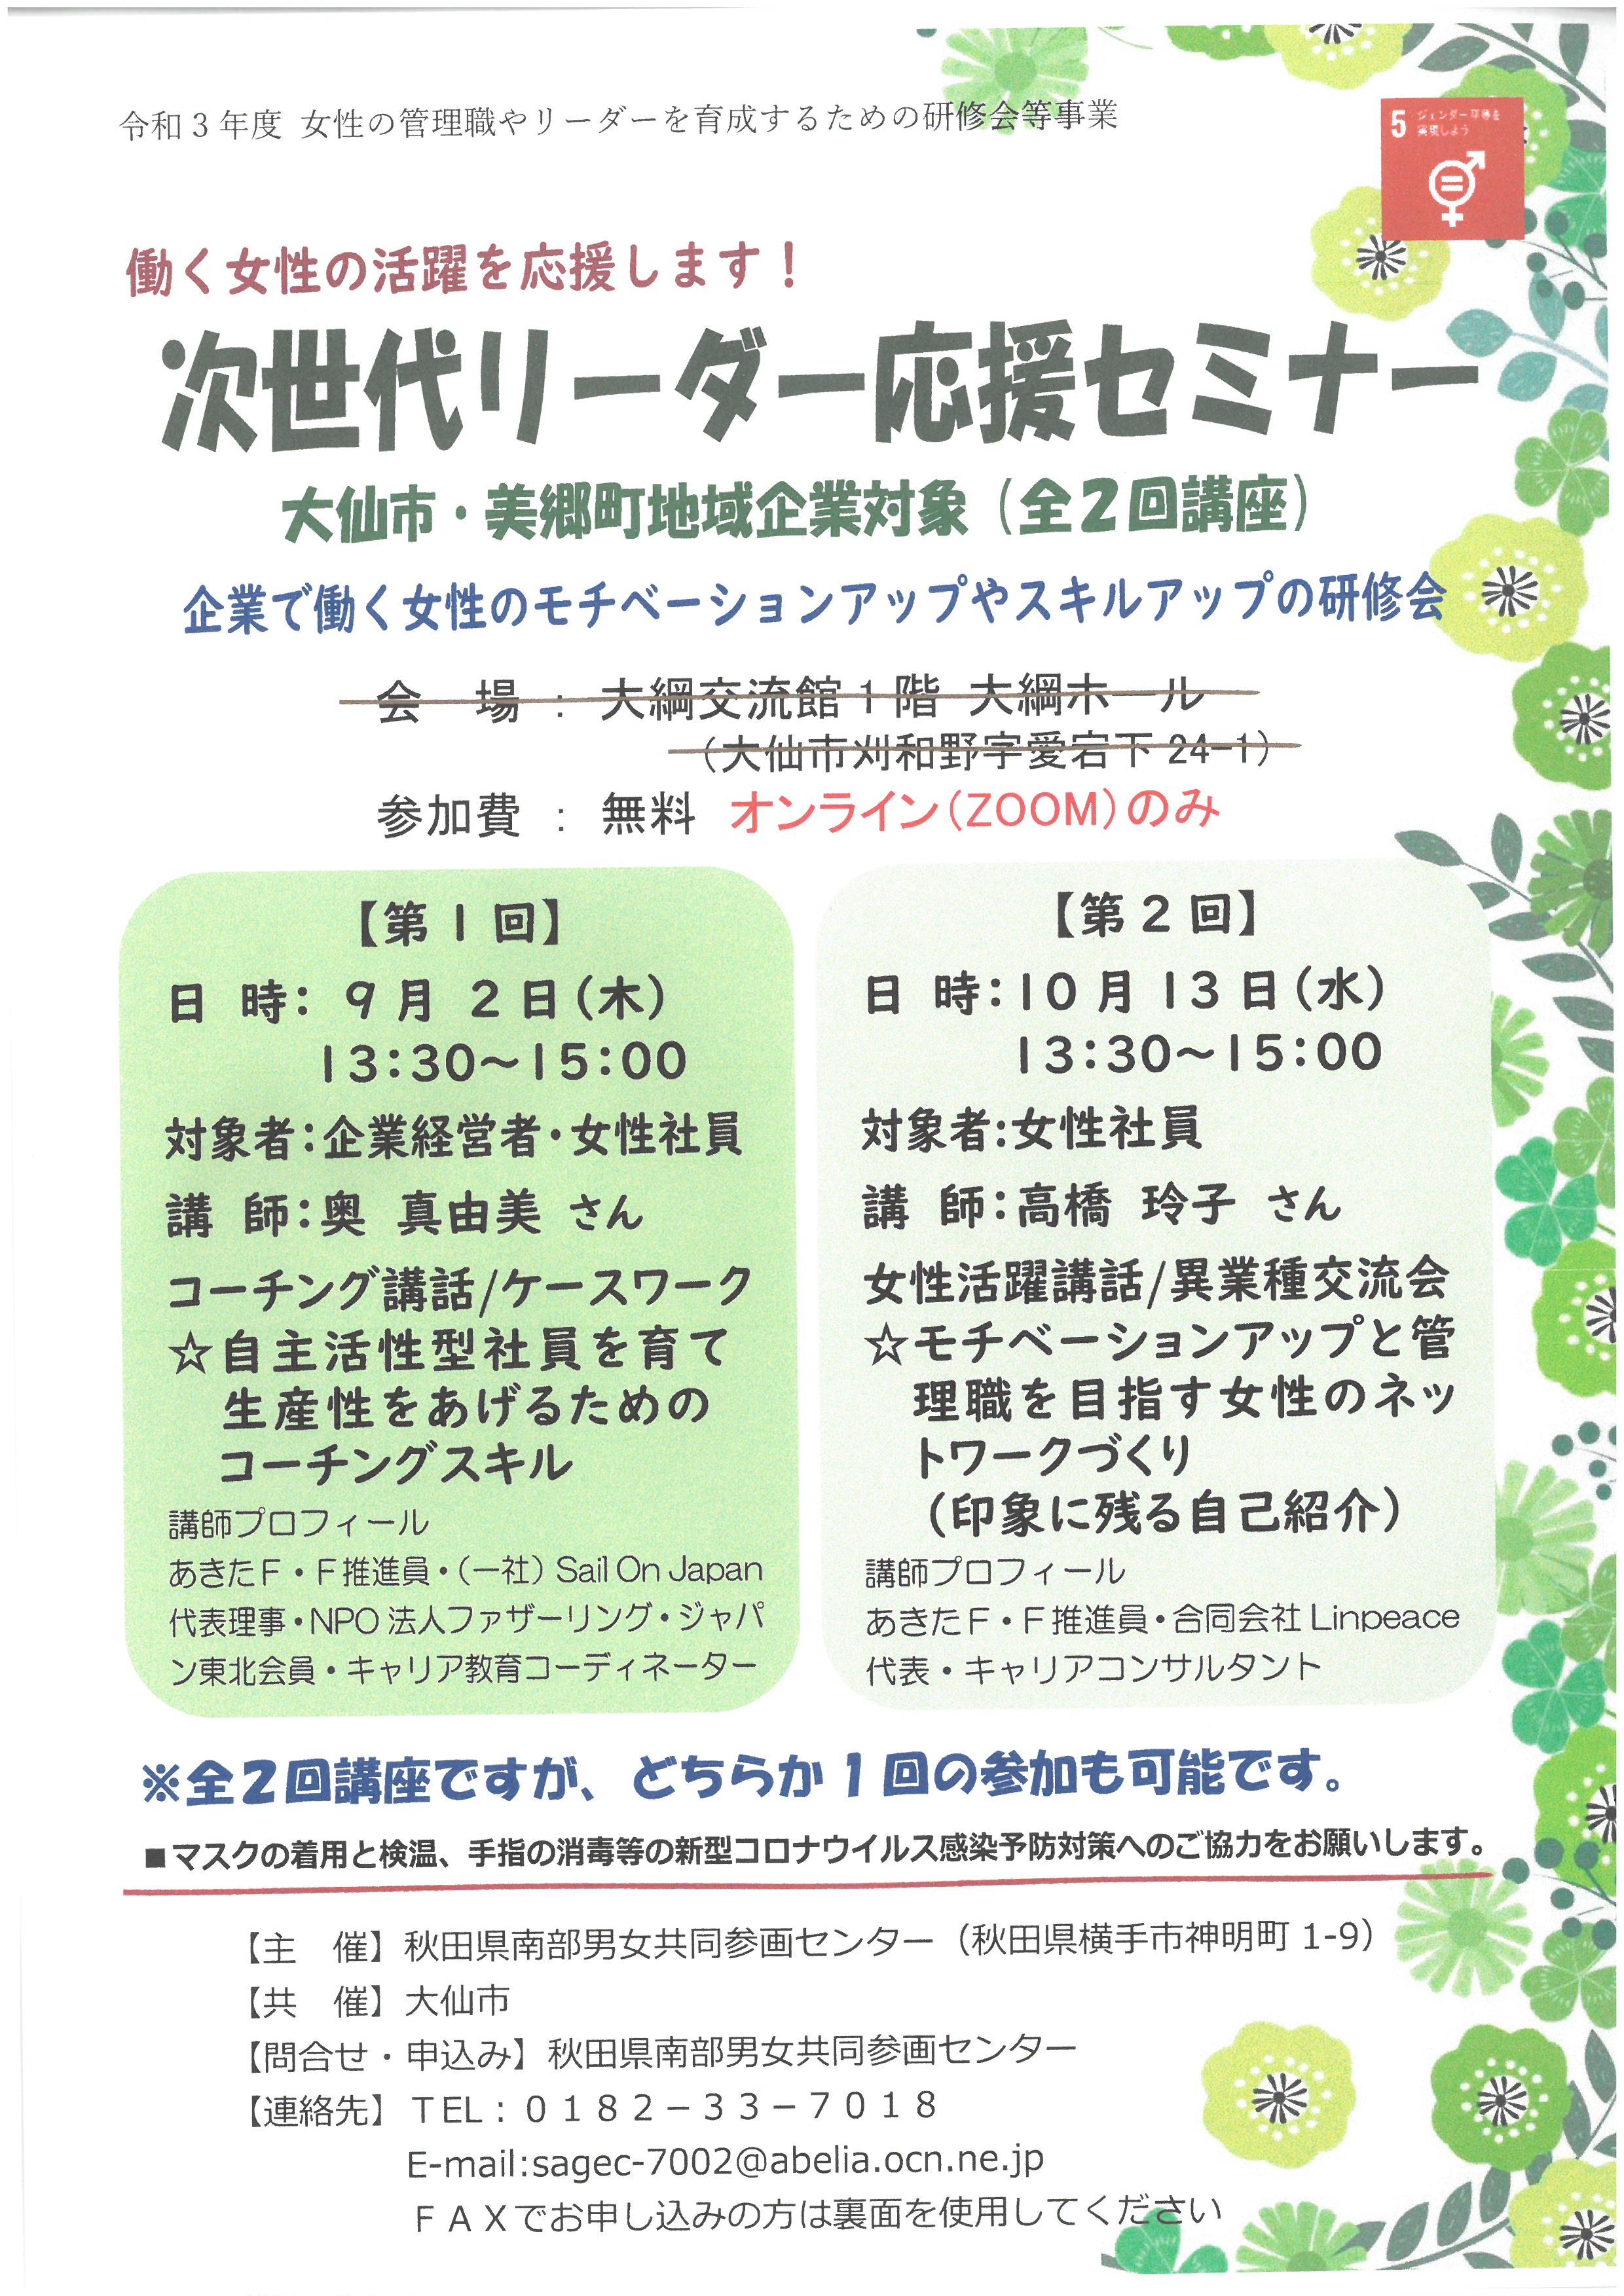 http://www.akita-south-jender.org/news/ZOOM%EF%BC%89.jpg